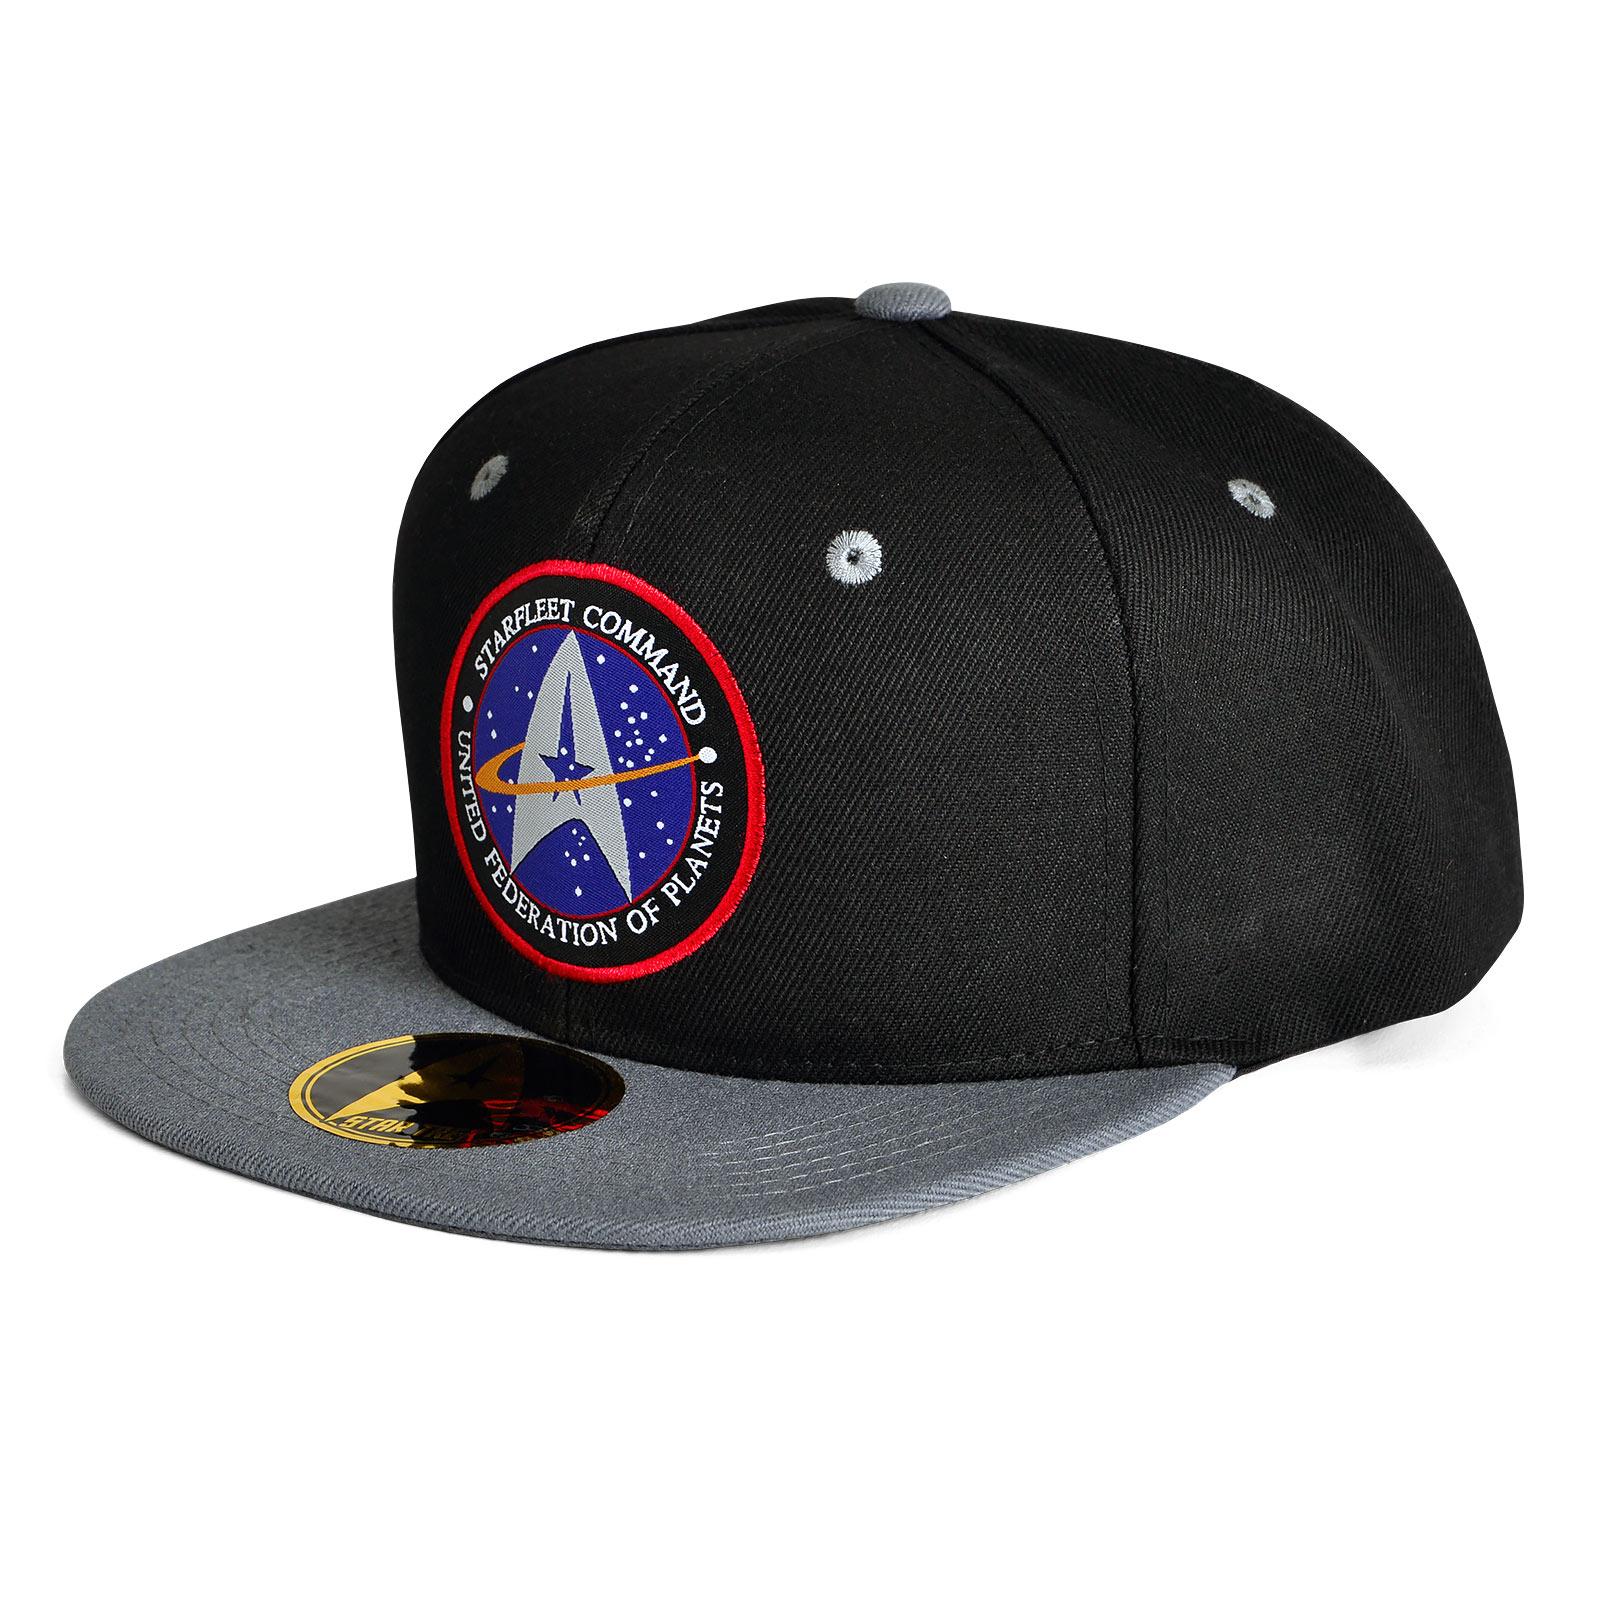 Star Trek - Starfleet Command Logo Basecap